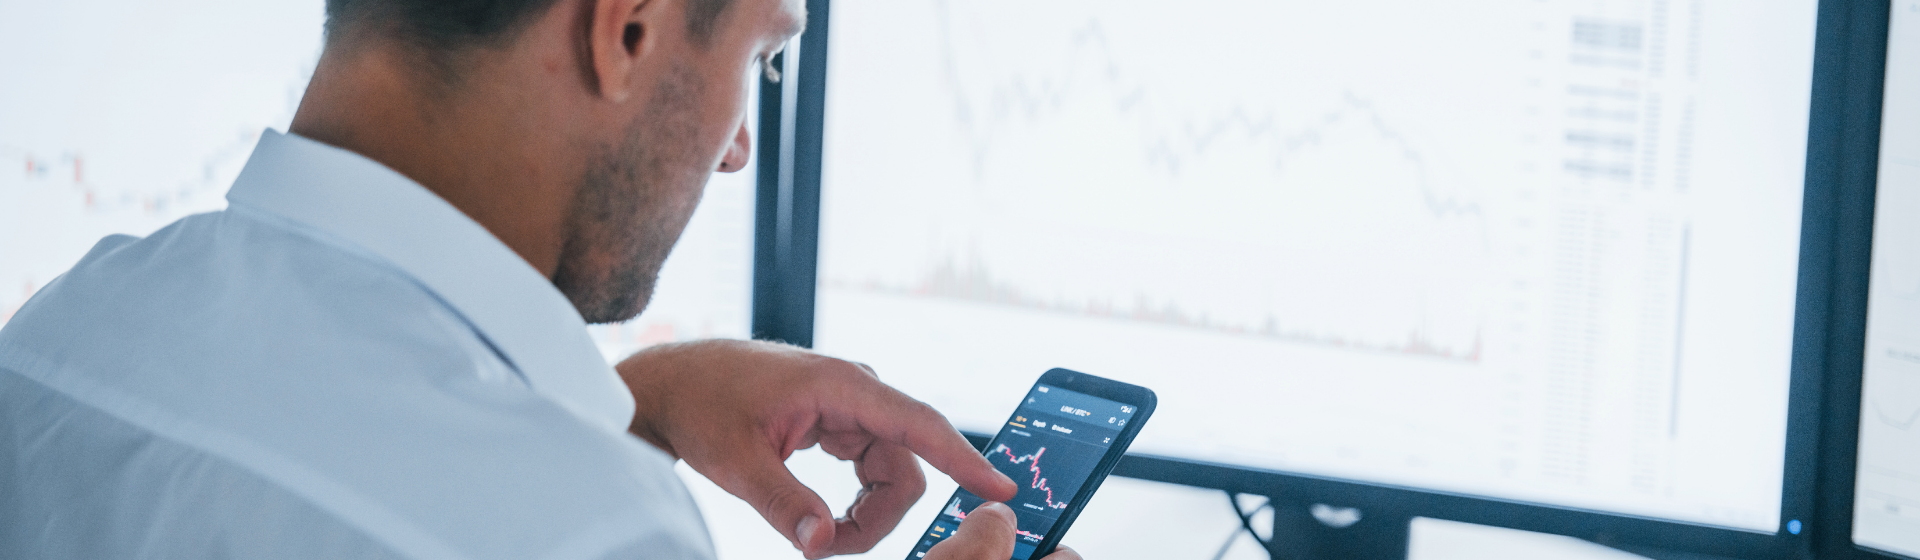 Digital Finance Solutions for the CFO